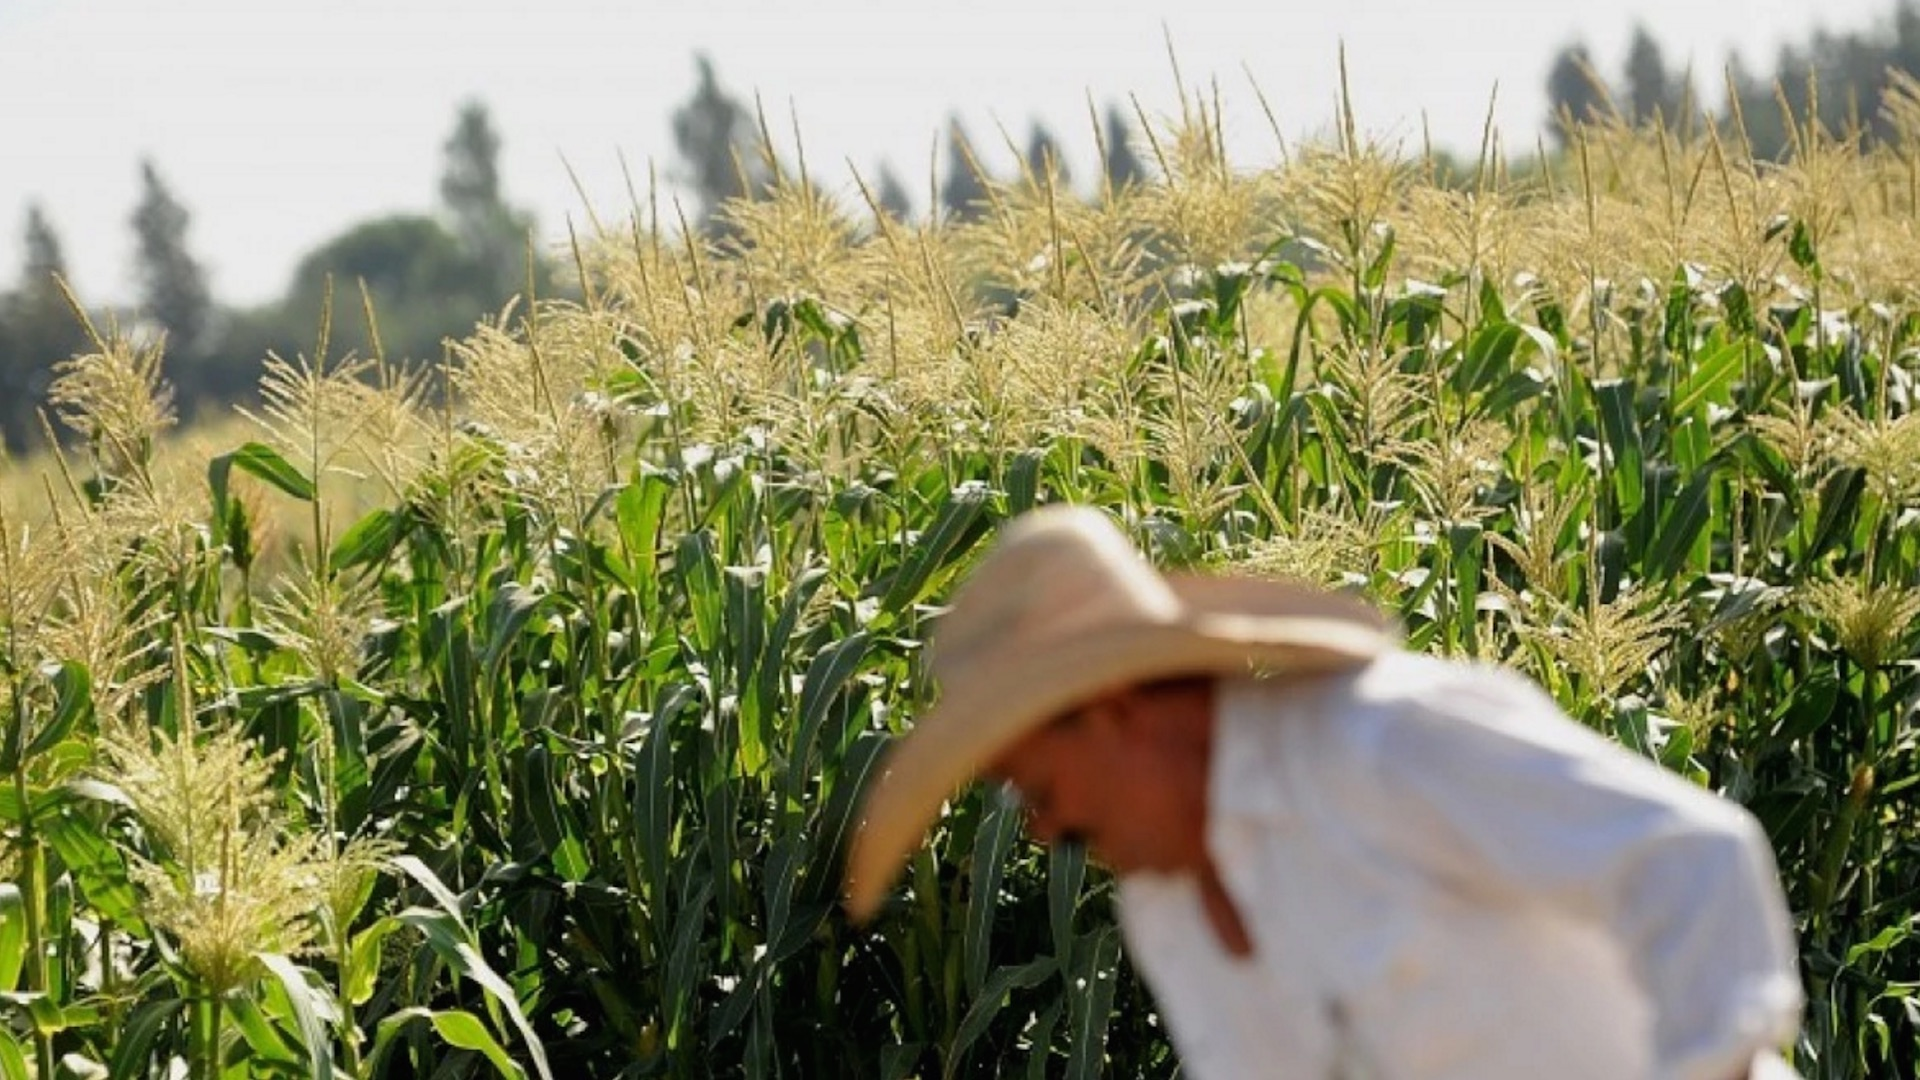 107 Nobel laureates sign letter blasting Greenpeace over GMOs